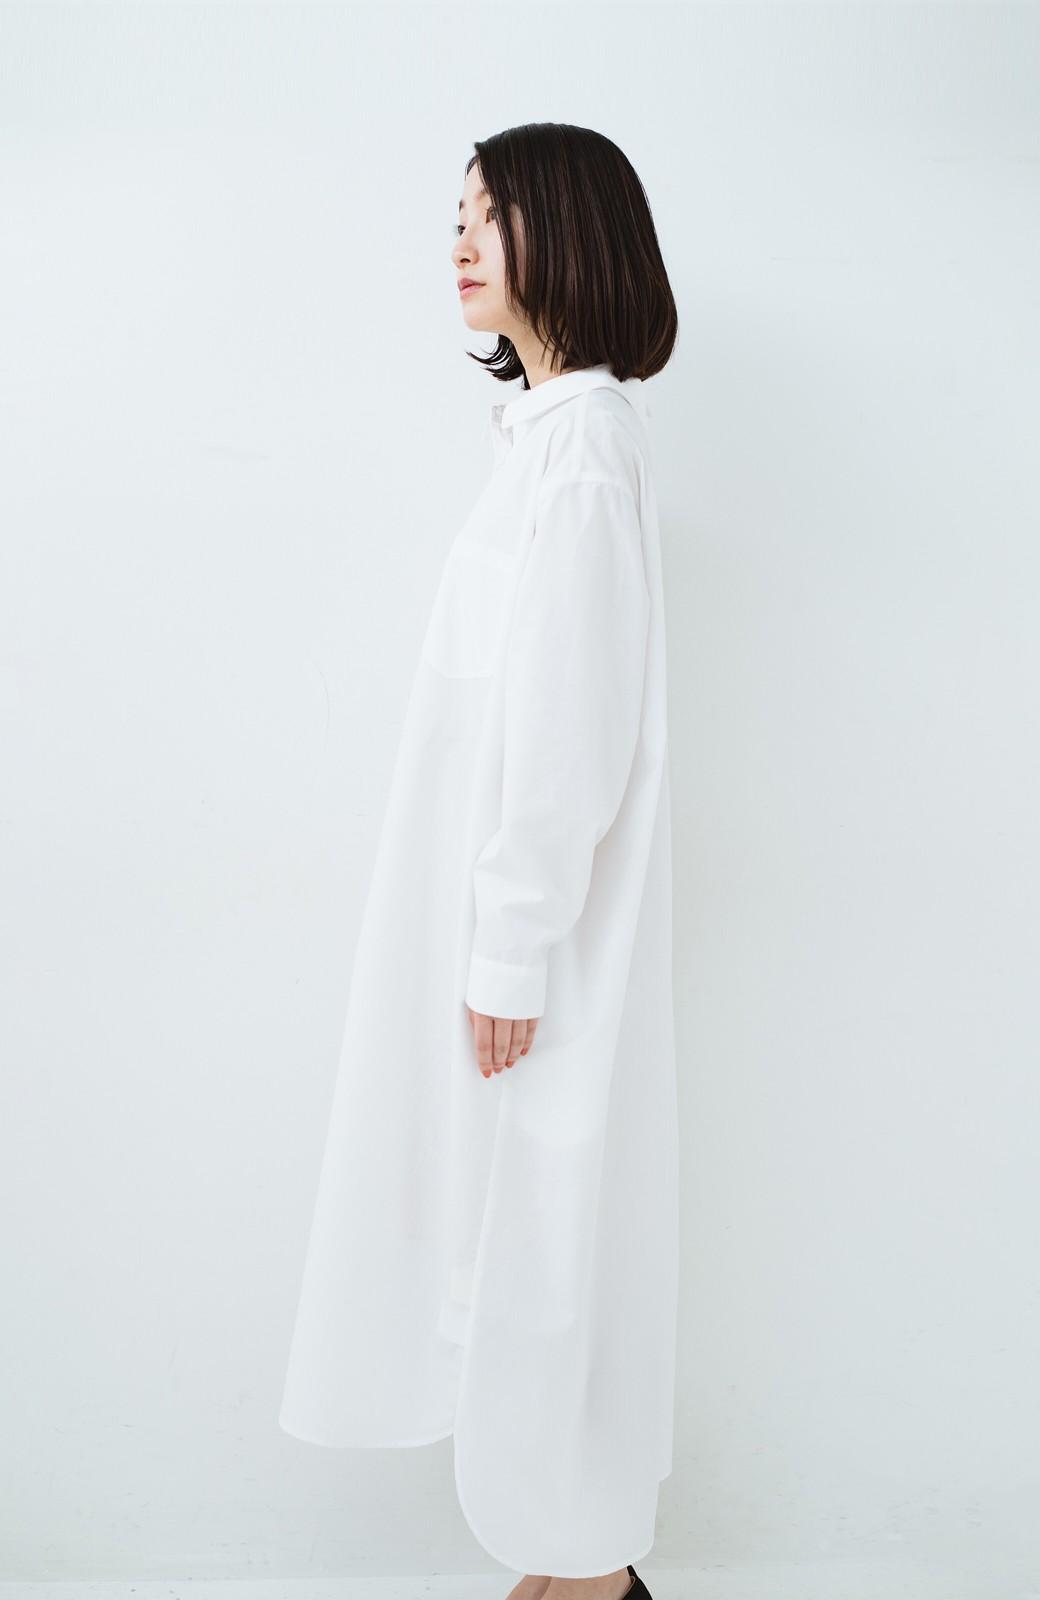 haco! 気持ちが凛と改まる リボン付きオーバーサイズシャツワンピース <ホワイト>の商品写真23